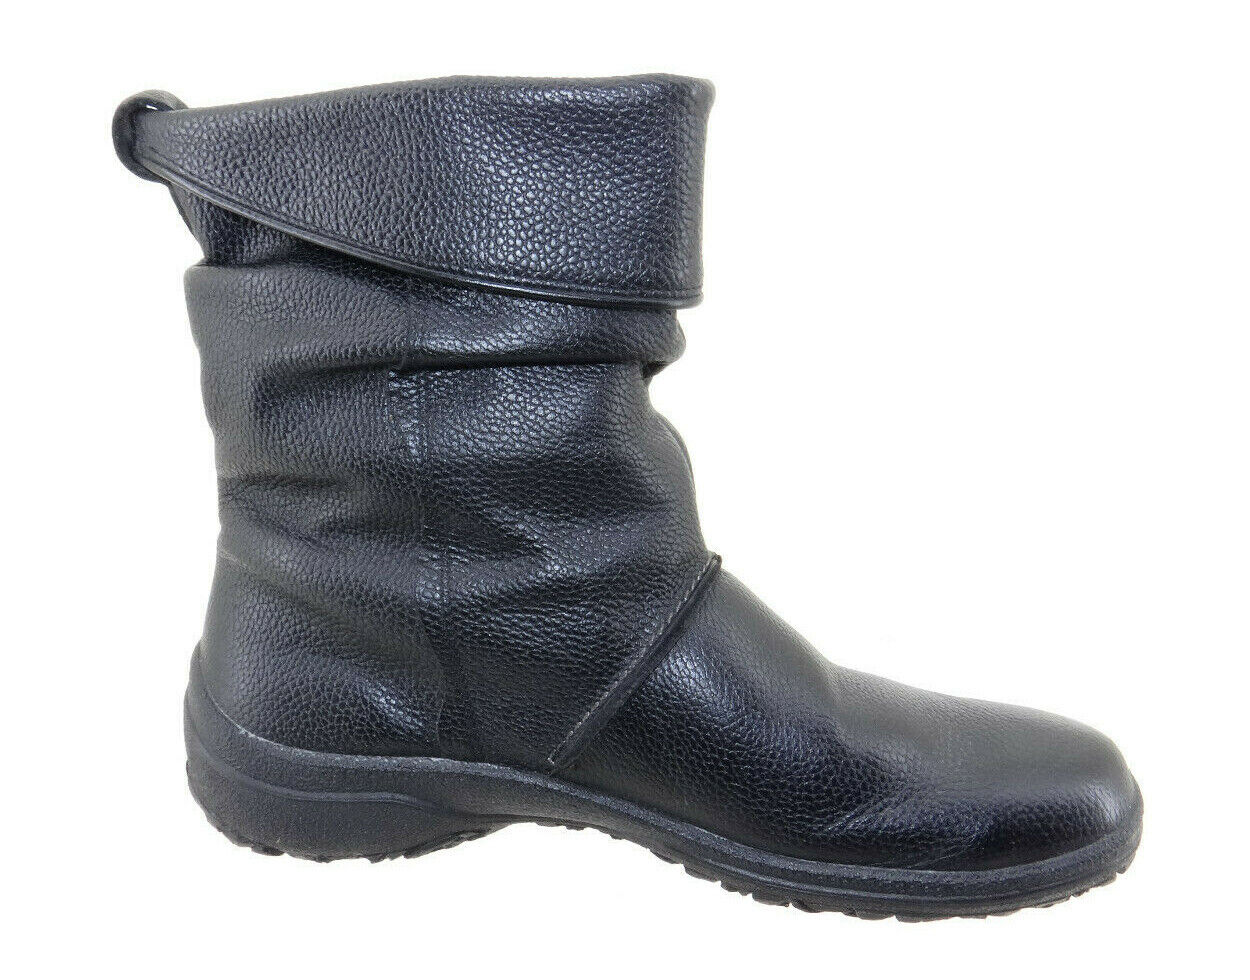 LEGERO Gore TEX Schuhe Stiefel Stiefeletten Boots Damenstiefel Gr. 42 Leder TOP